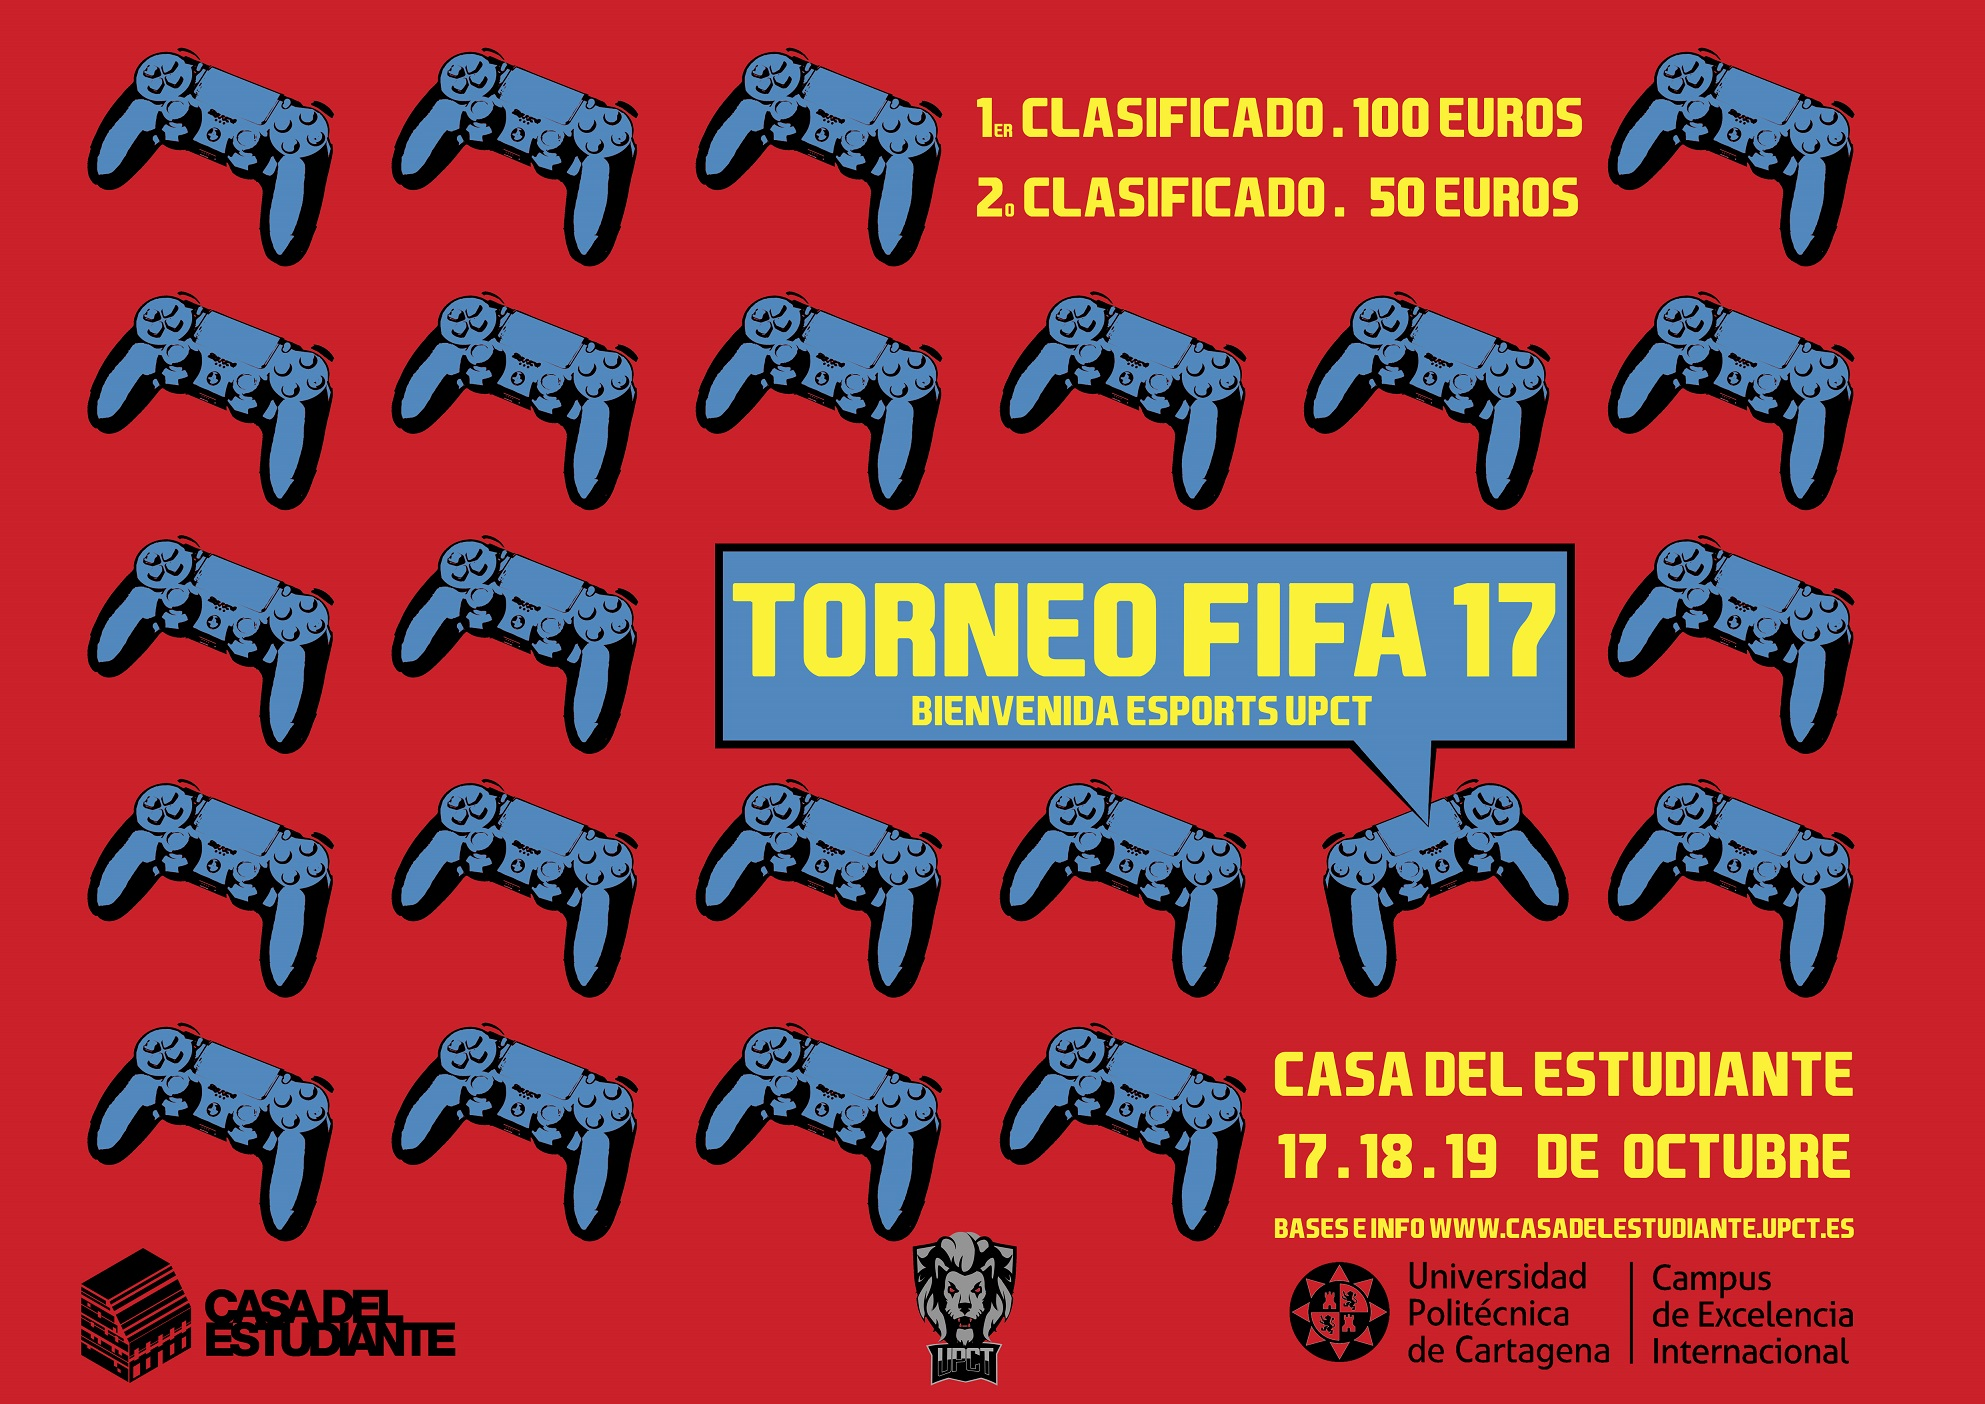 Torneo FIFA 17 Bienvenida eSports UPCT